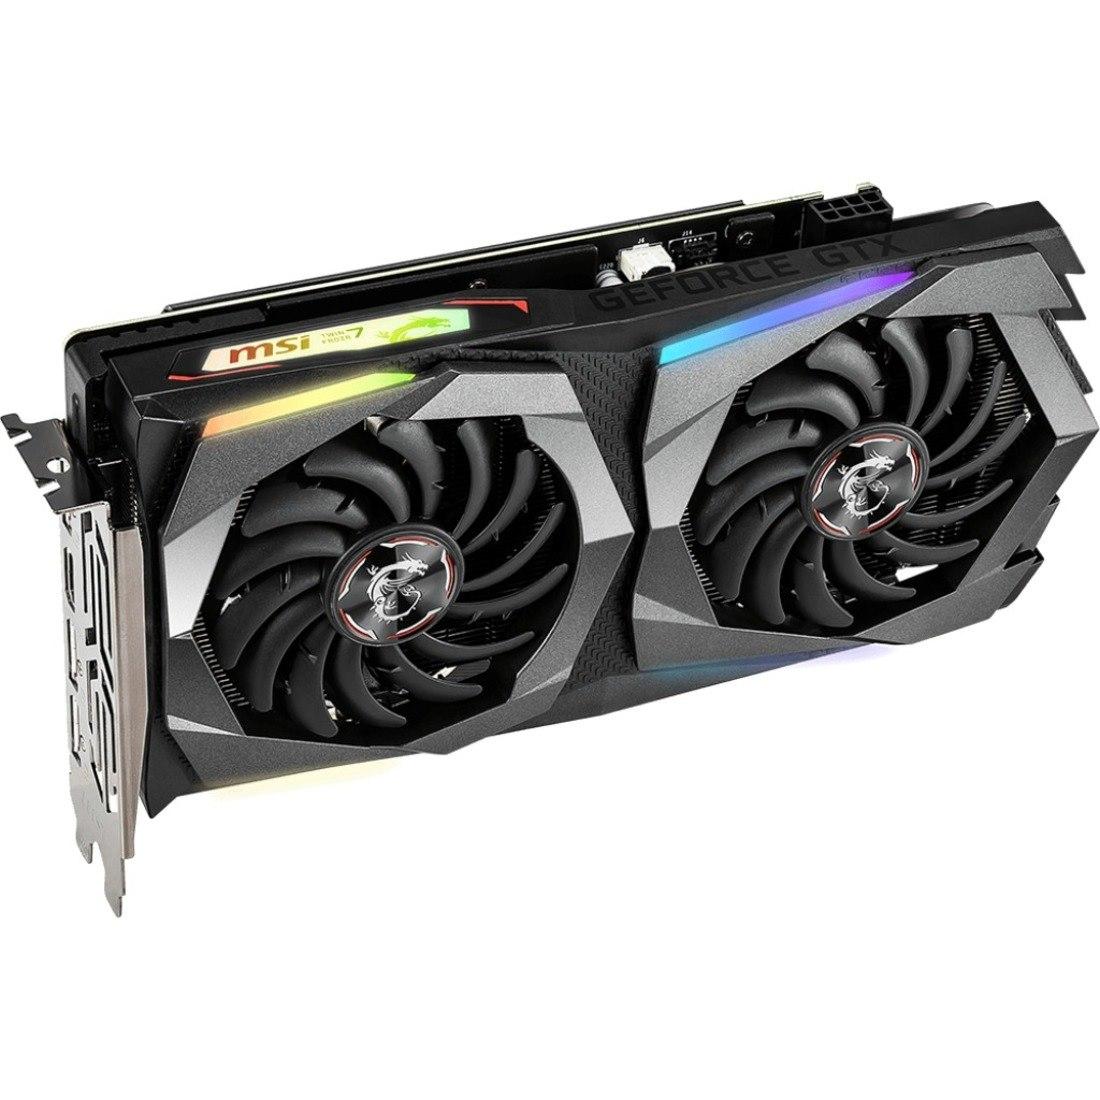 MSI GTX 1660 TI GAMING X 6G GeForce GTX 1660 Ti Graphic Card - 6 GB GDDR6